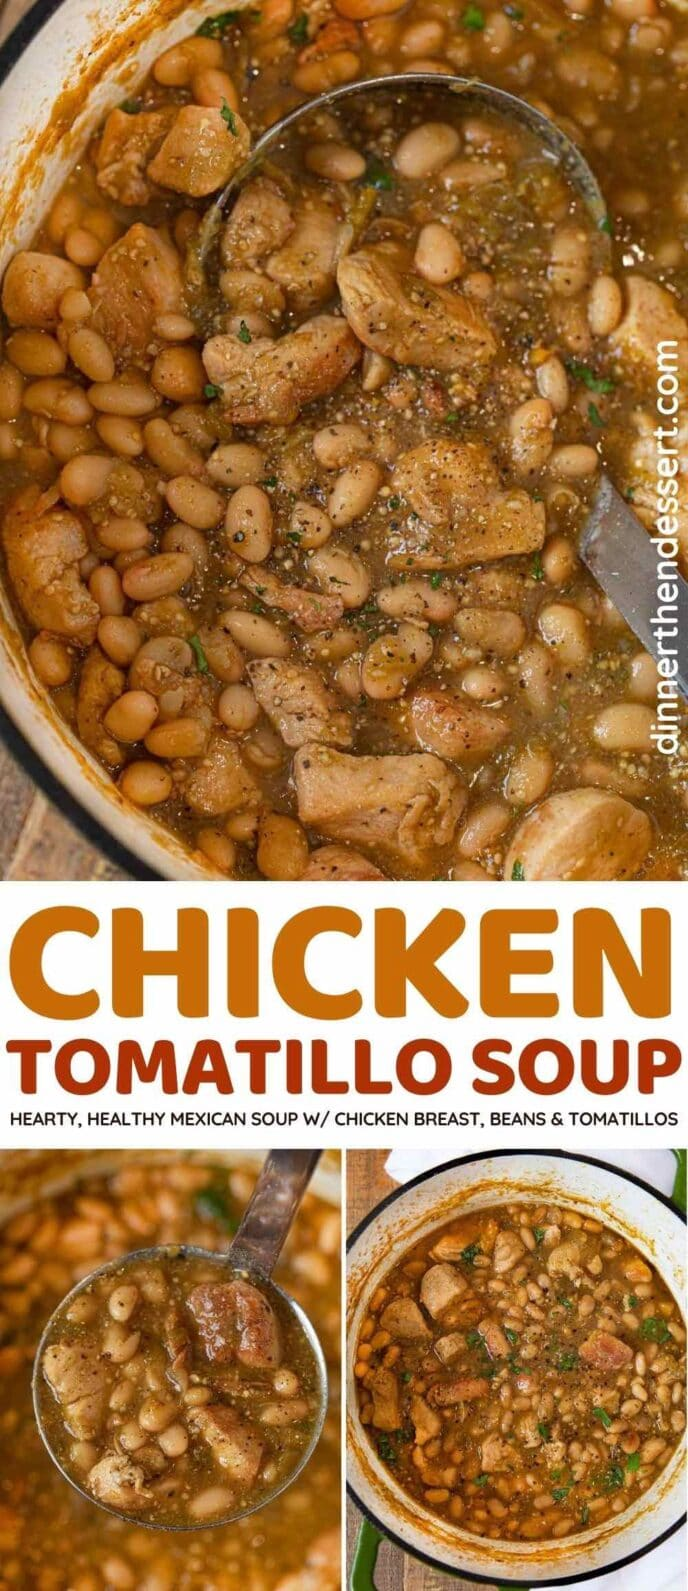 Chicken Tomatillo Soup collage